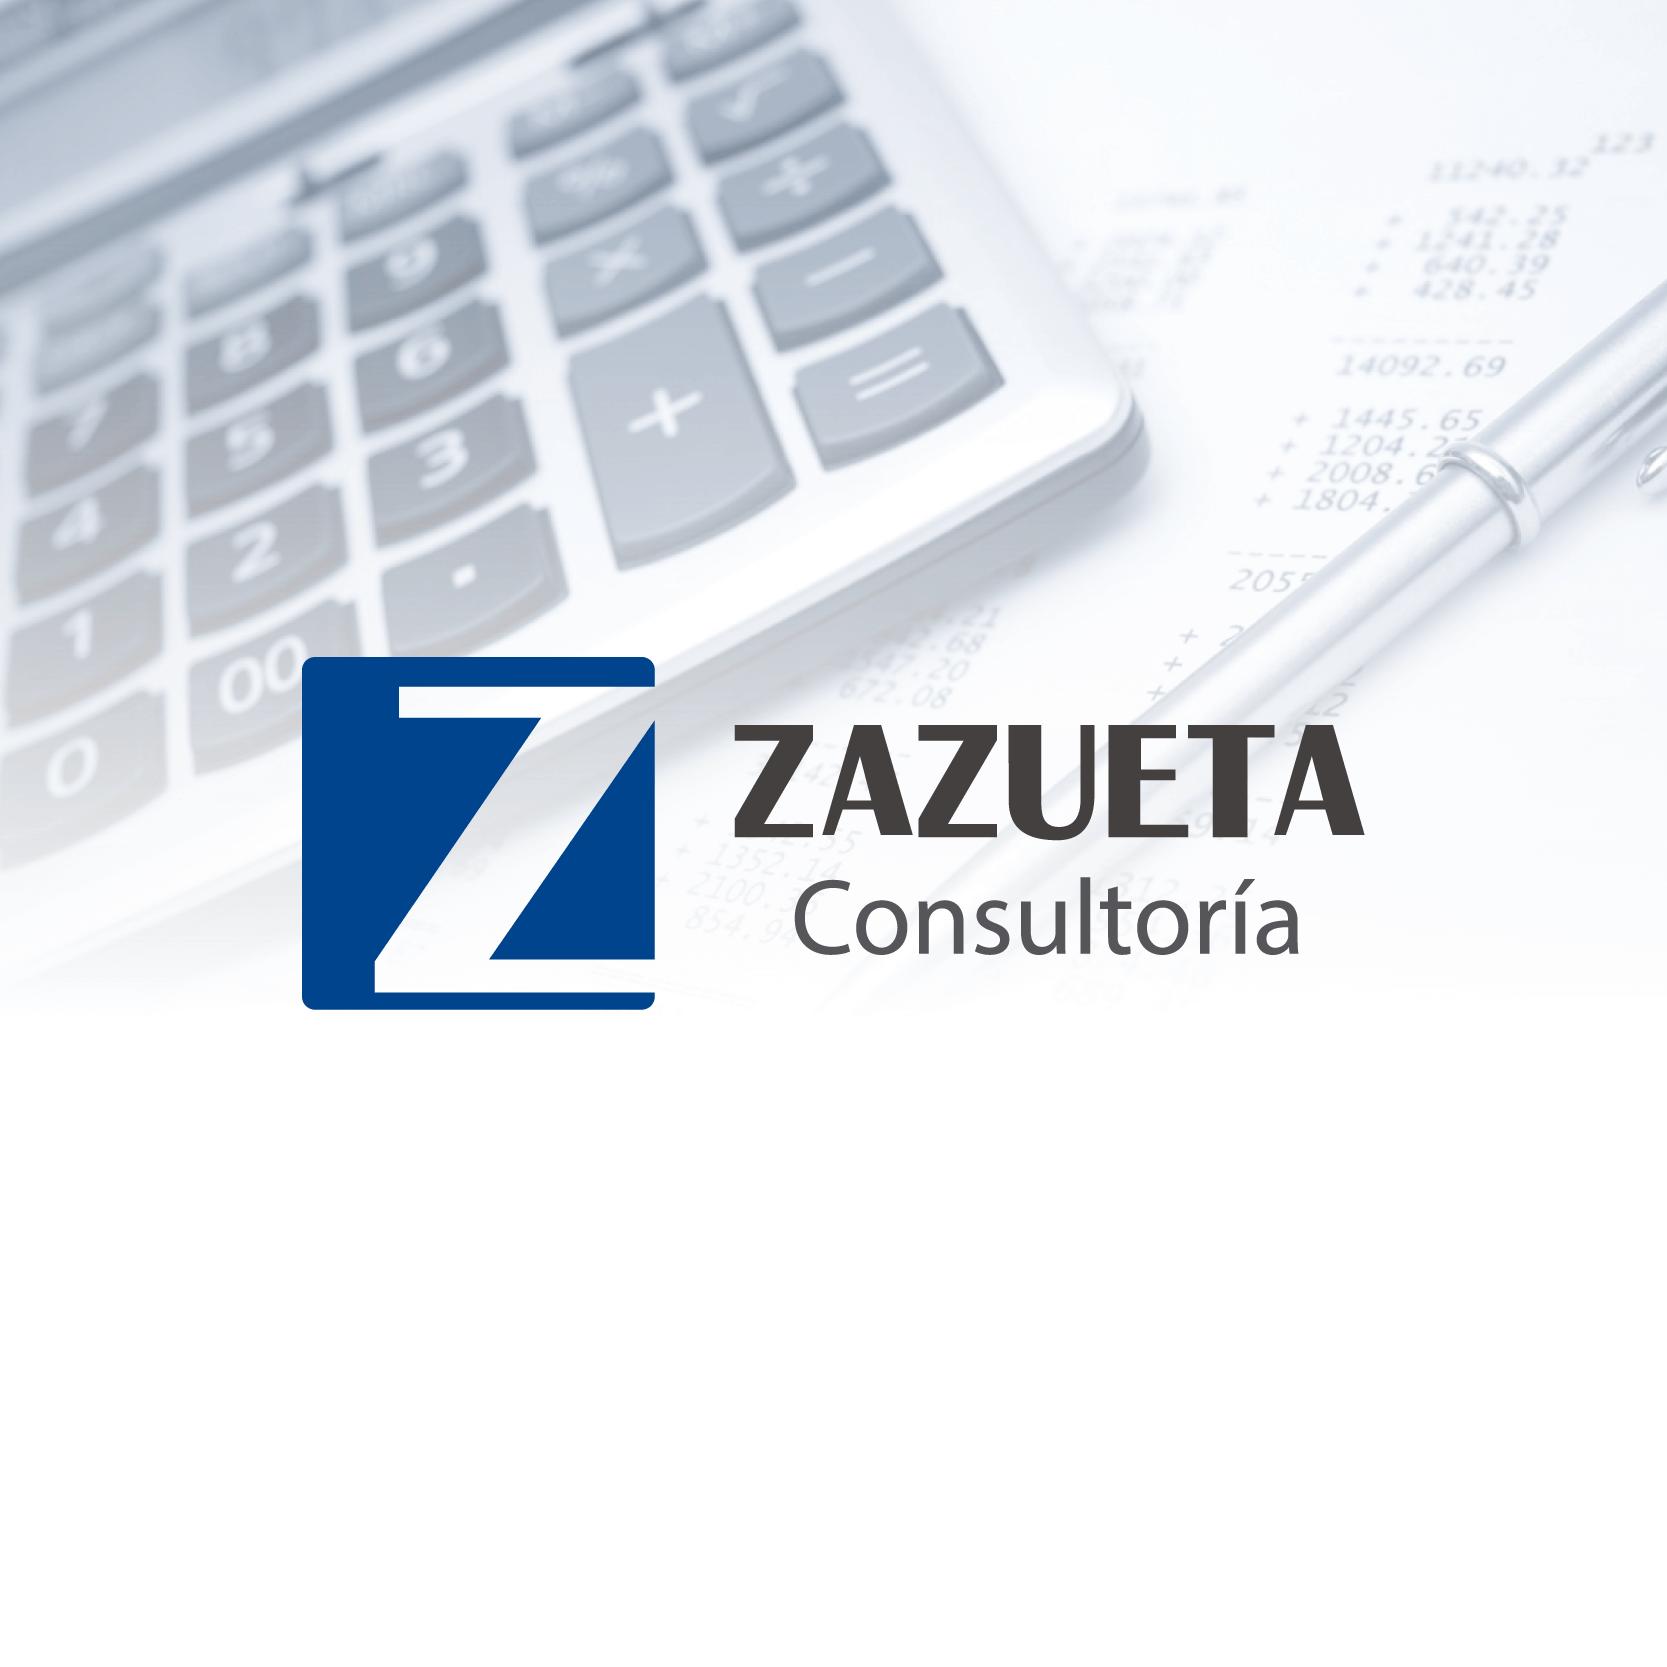 Overflow - Zazueta Consultoría-01